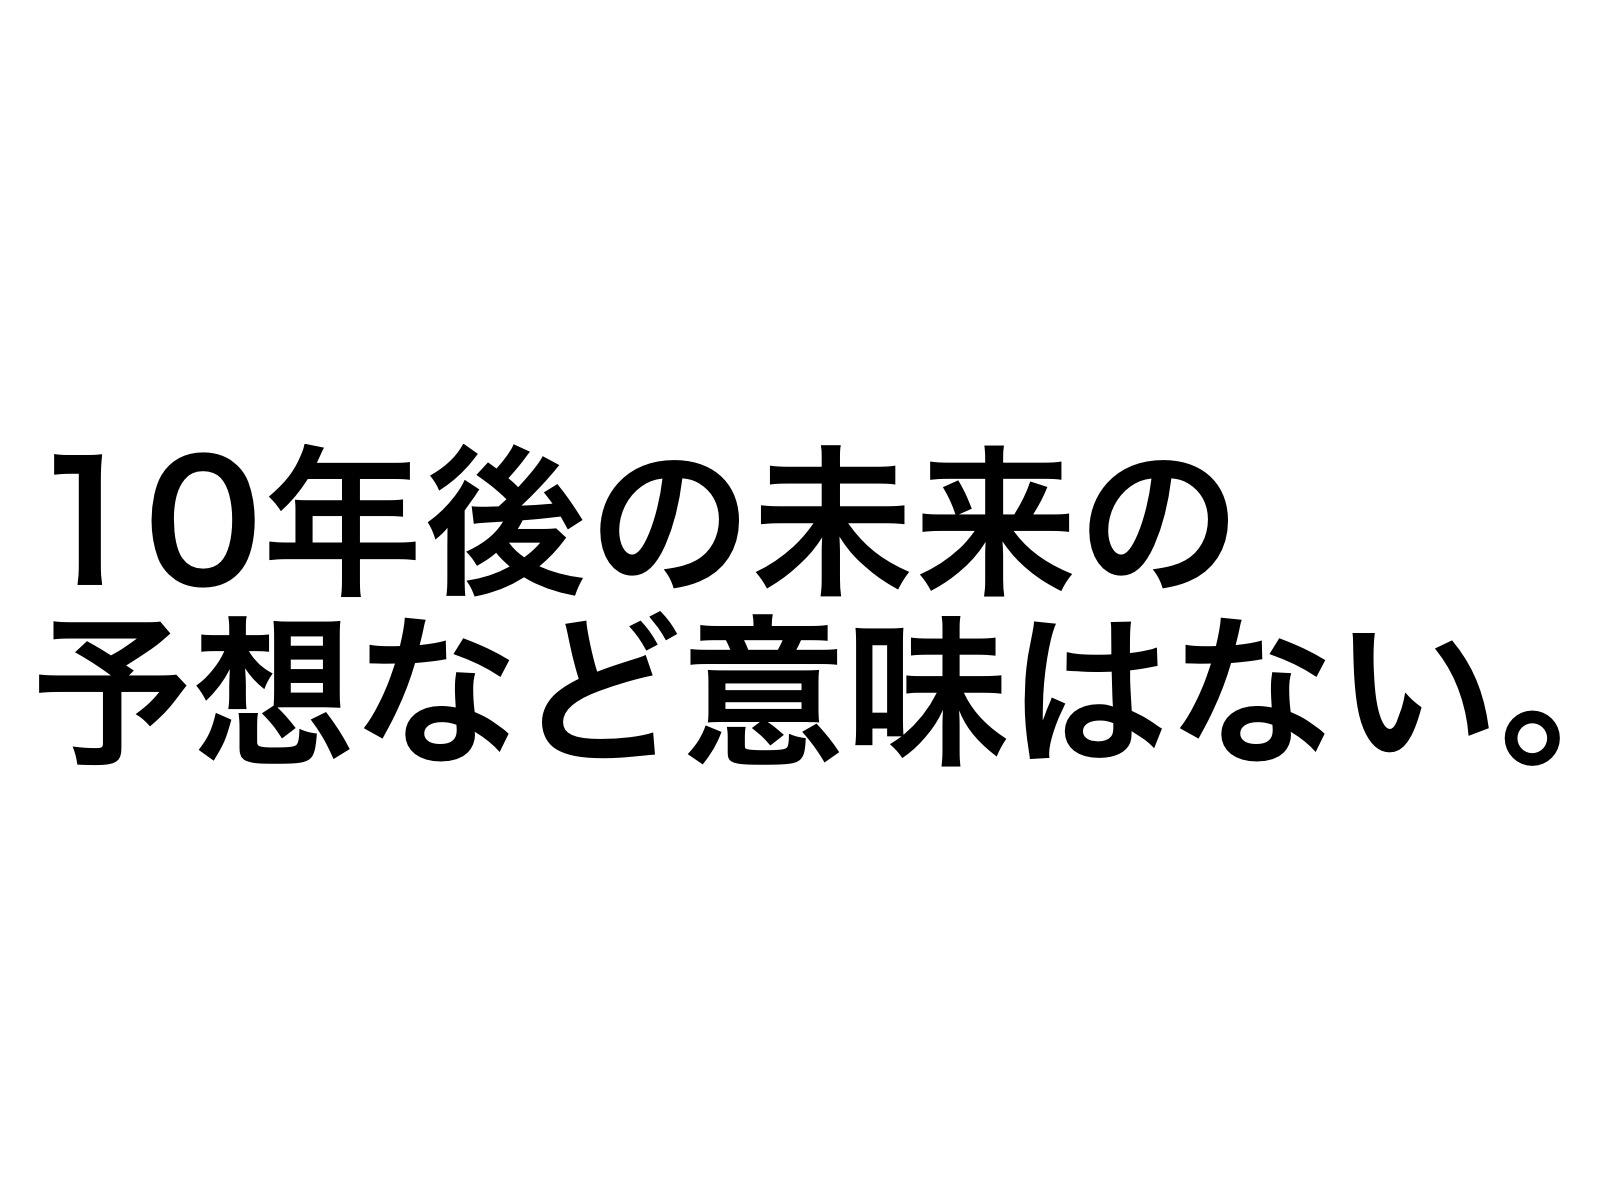 2016 11 01 19 18 12